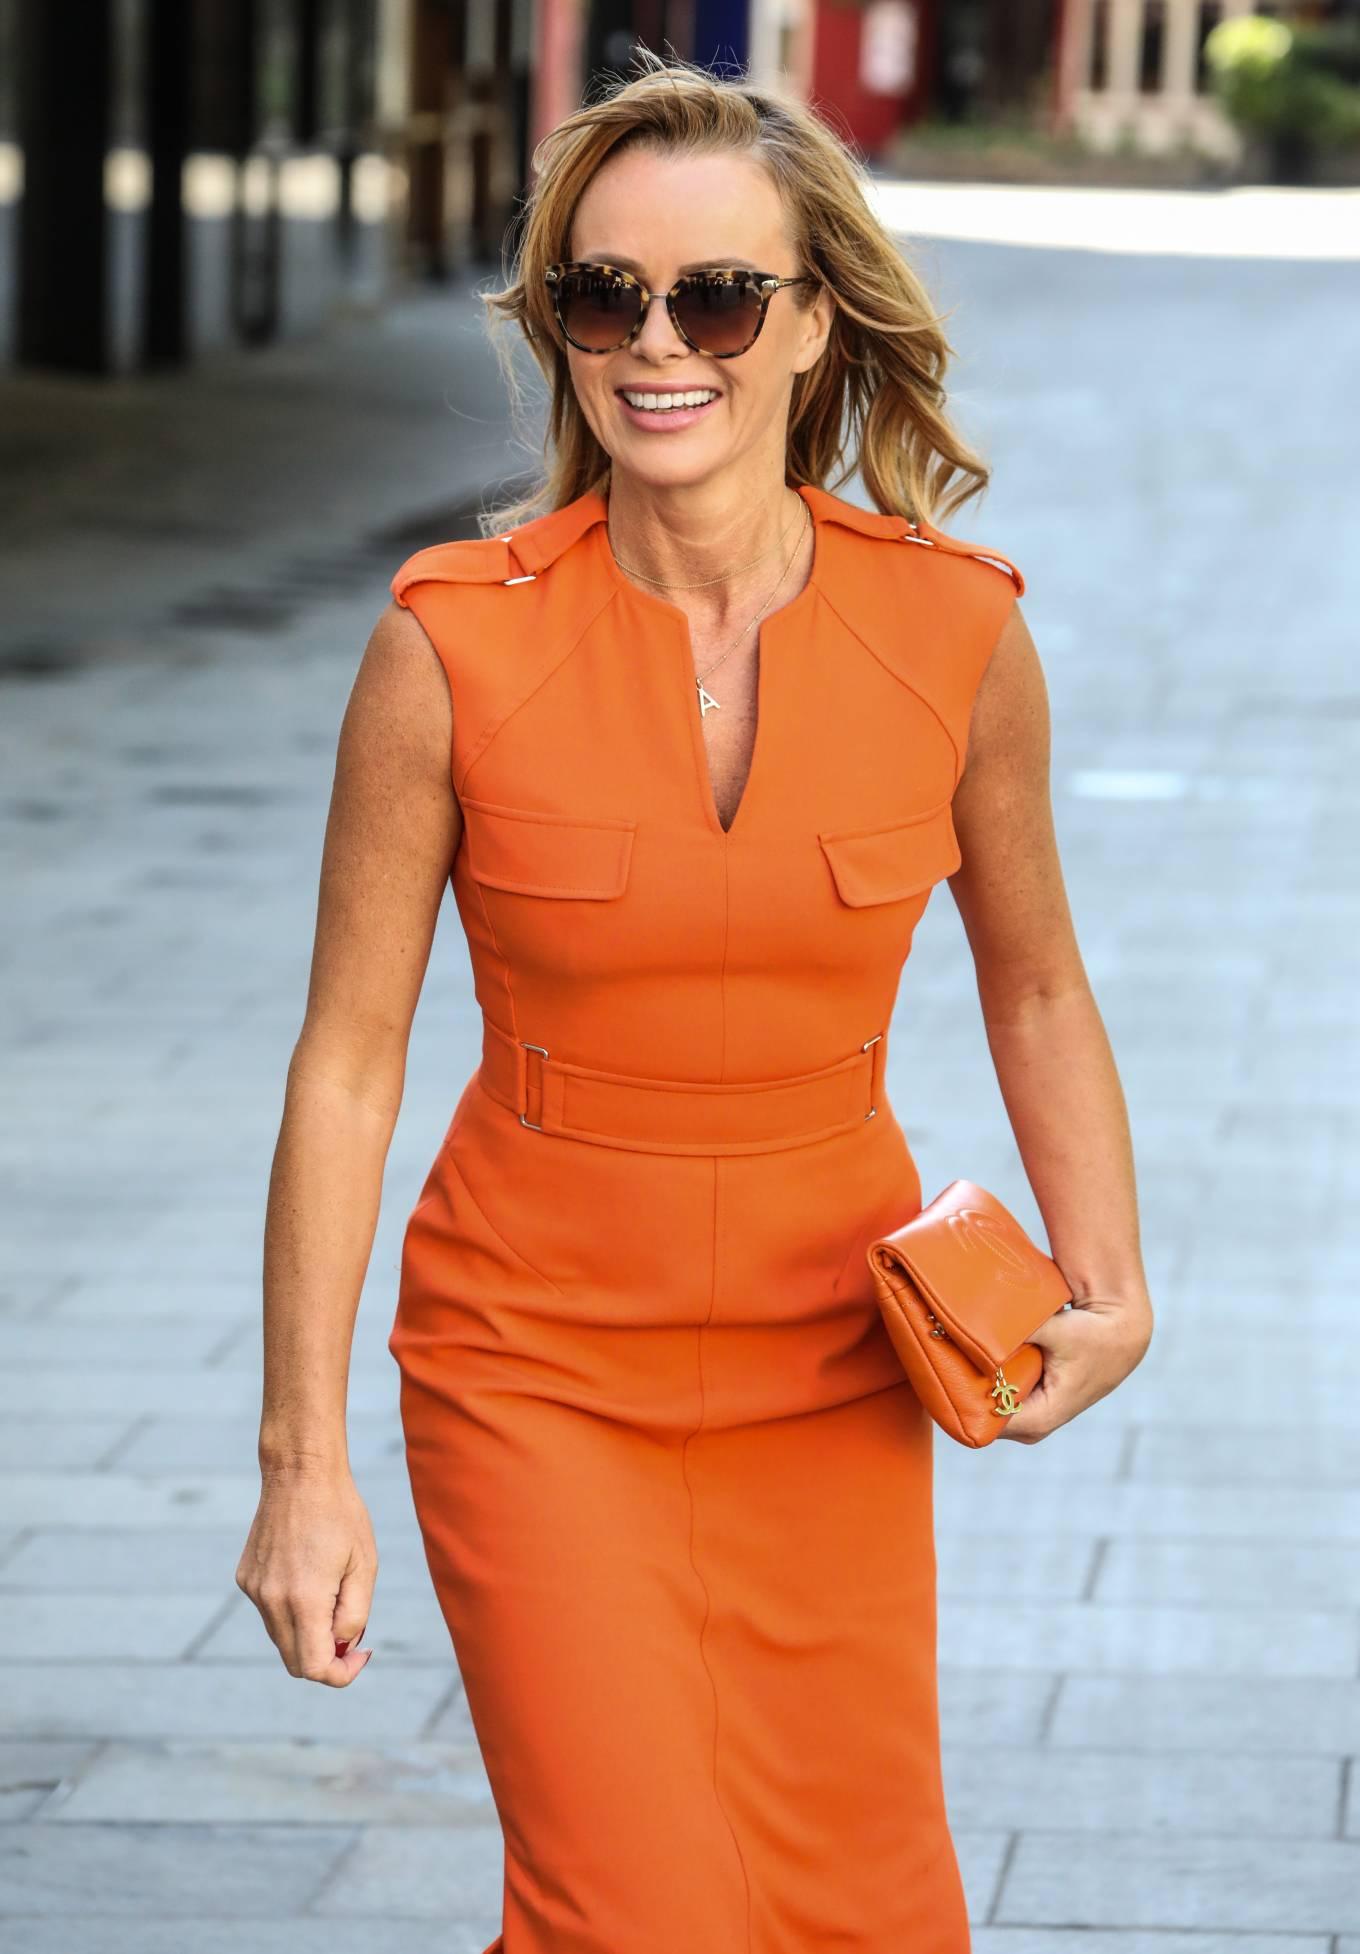 Amanda Holden in Orange Dress - Leaving Global Radio Studios in London